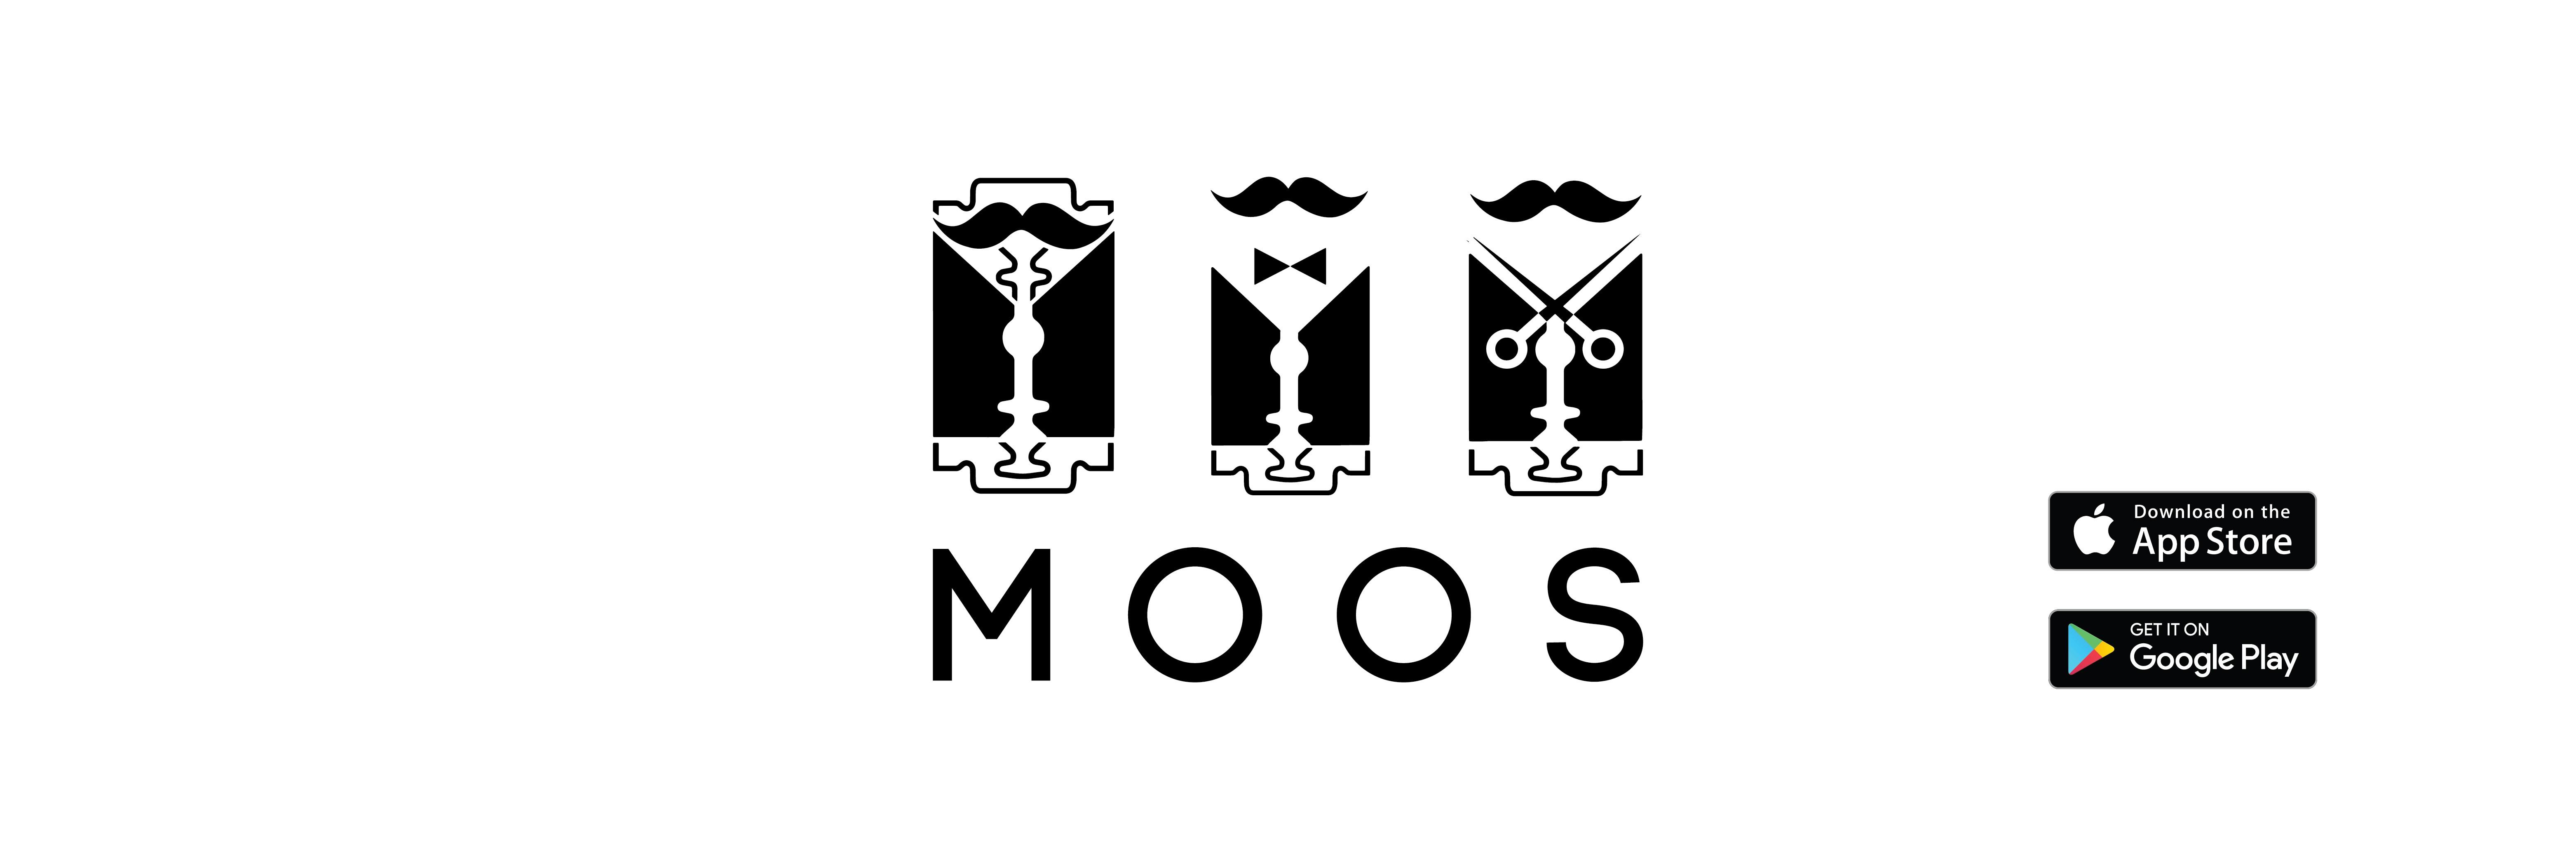 Design an App logo for Barbers